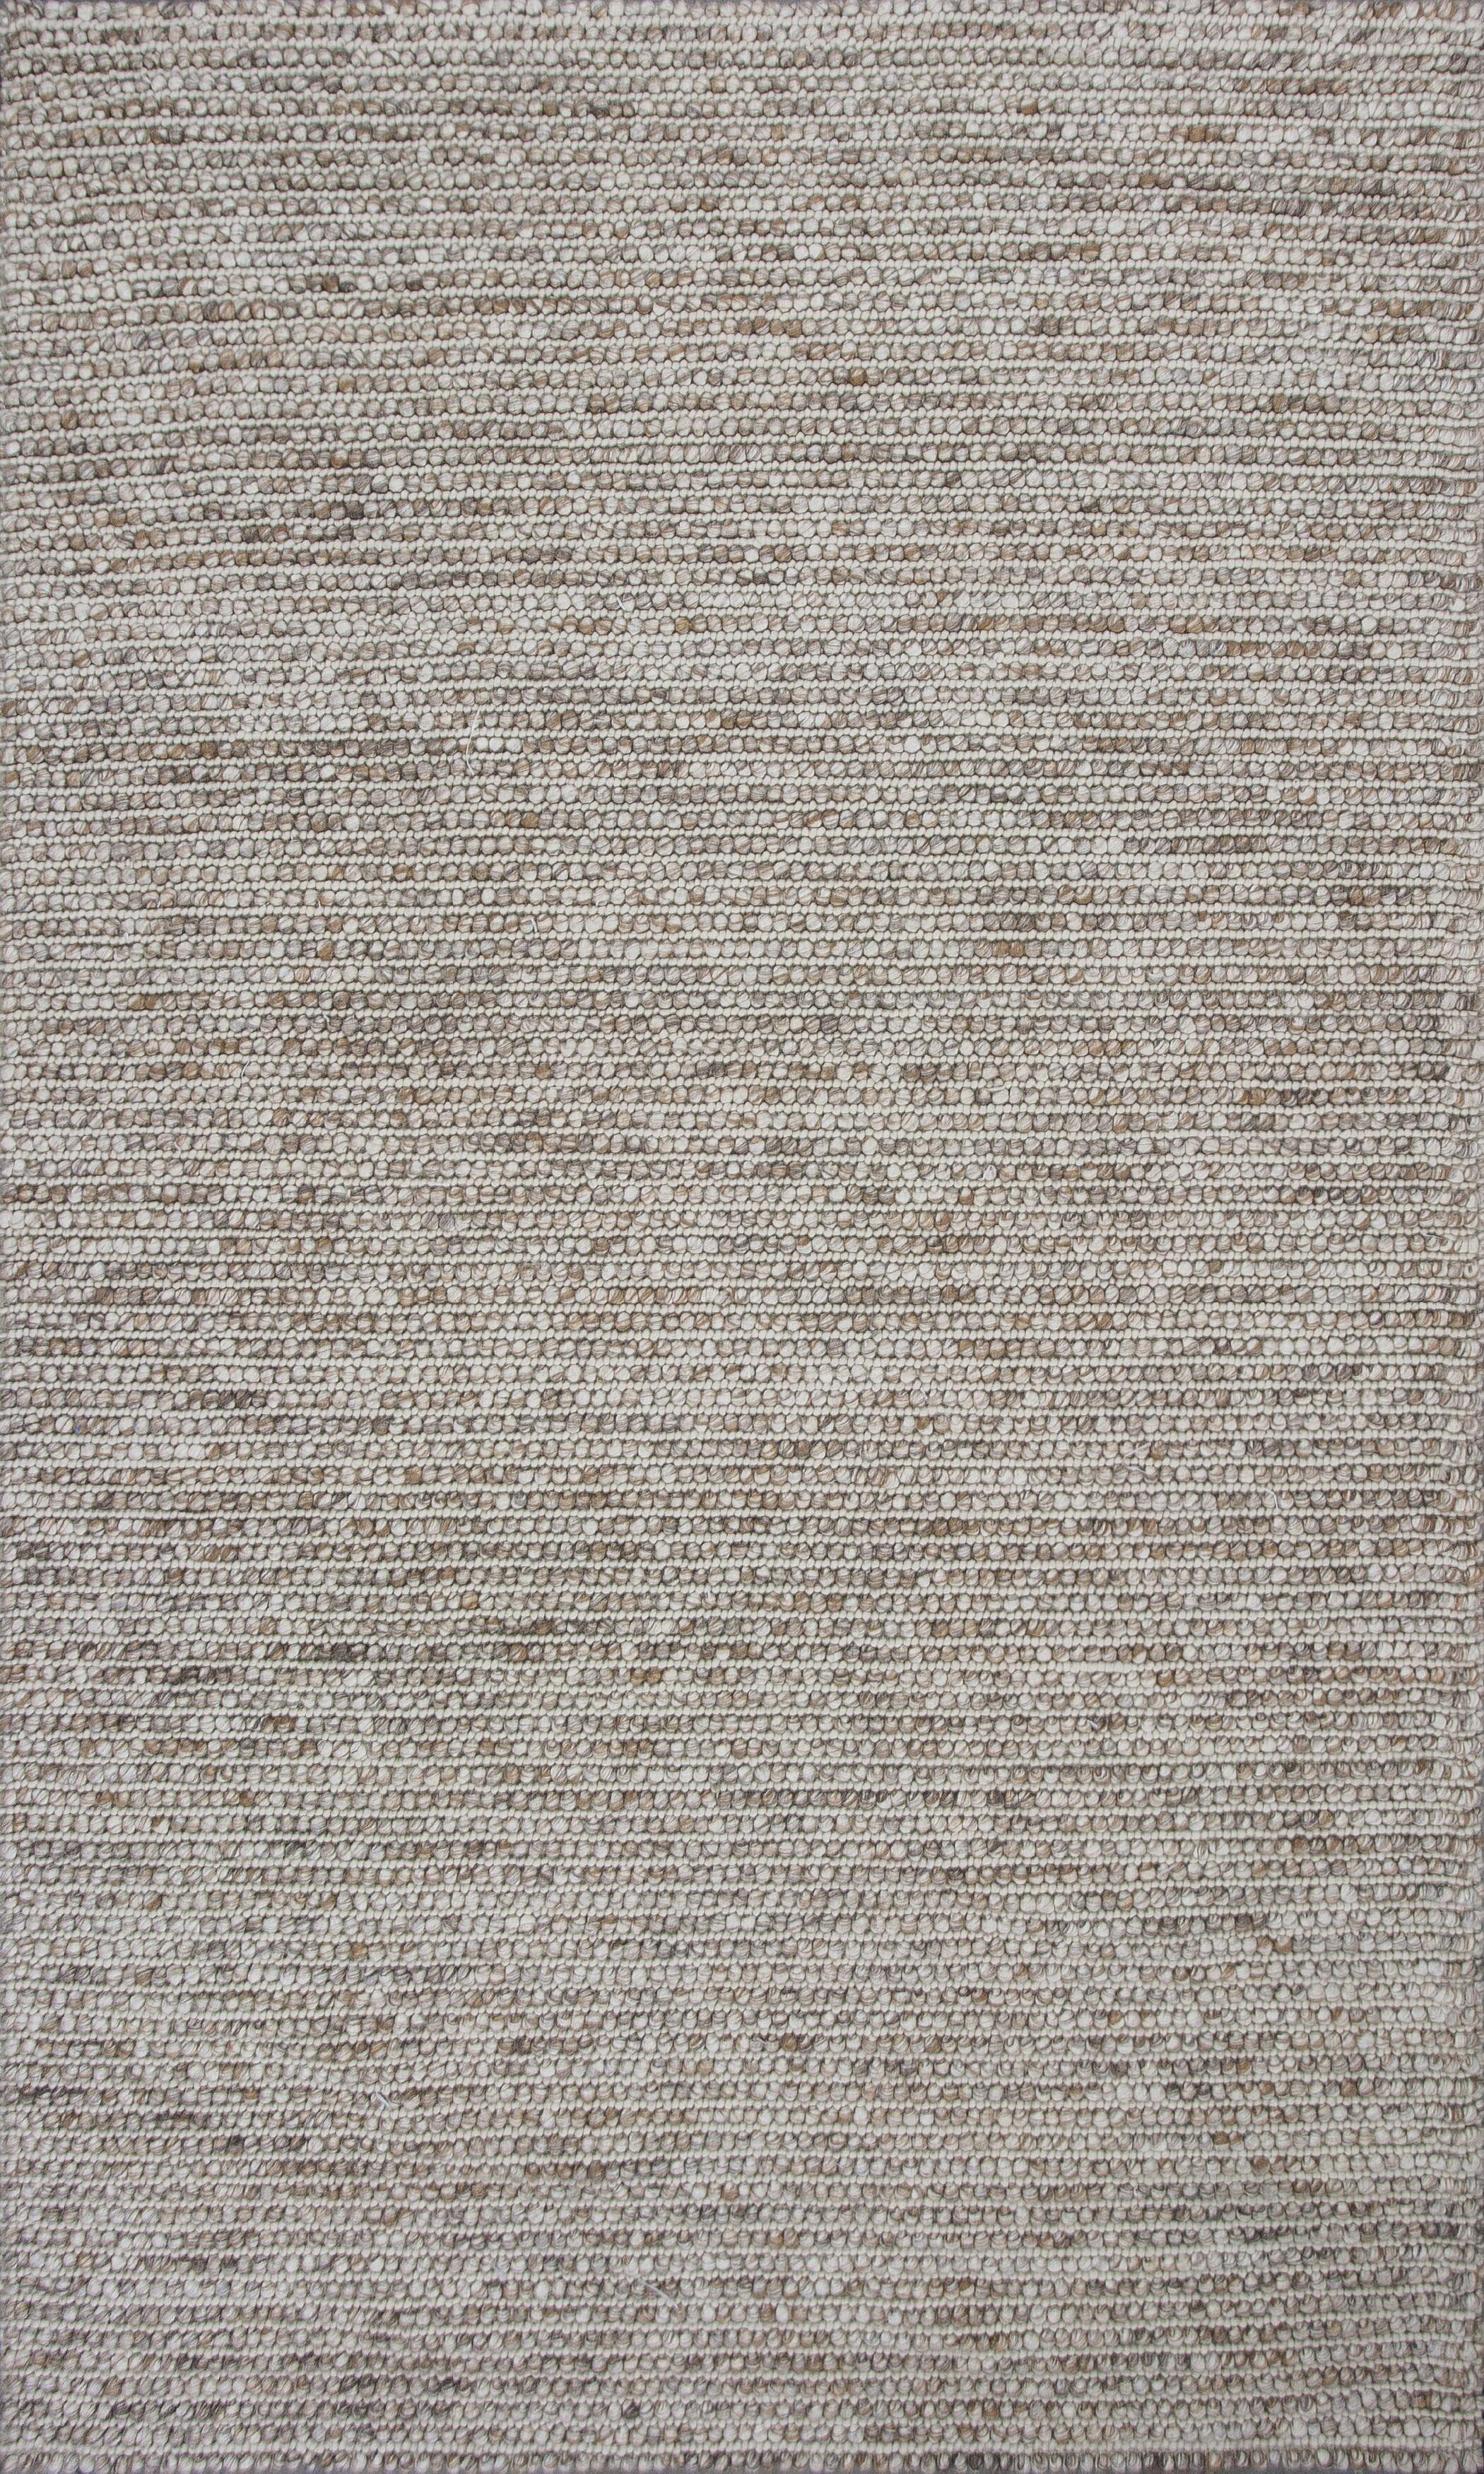 Errol Hand Woven Wool Beige Area Rug Size: 7'6